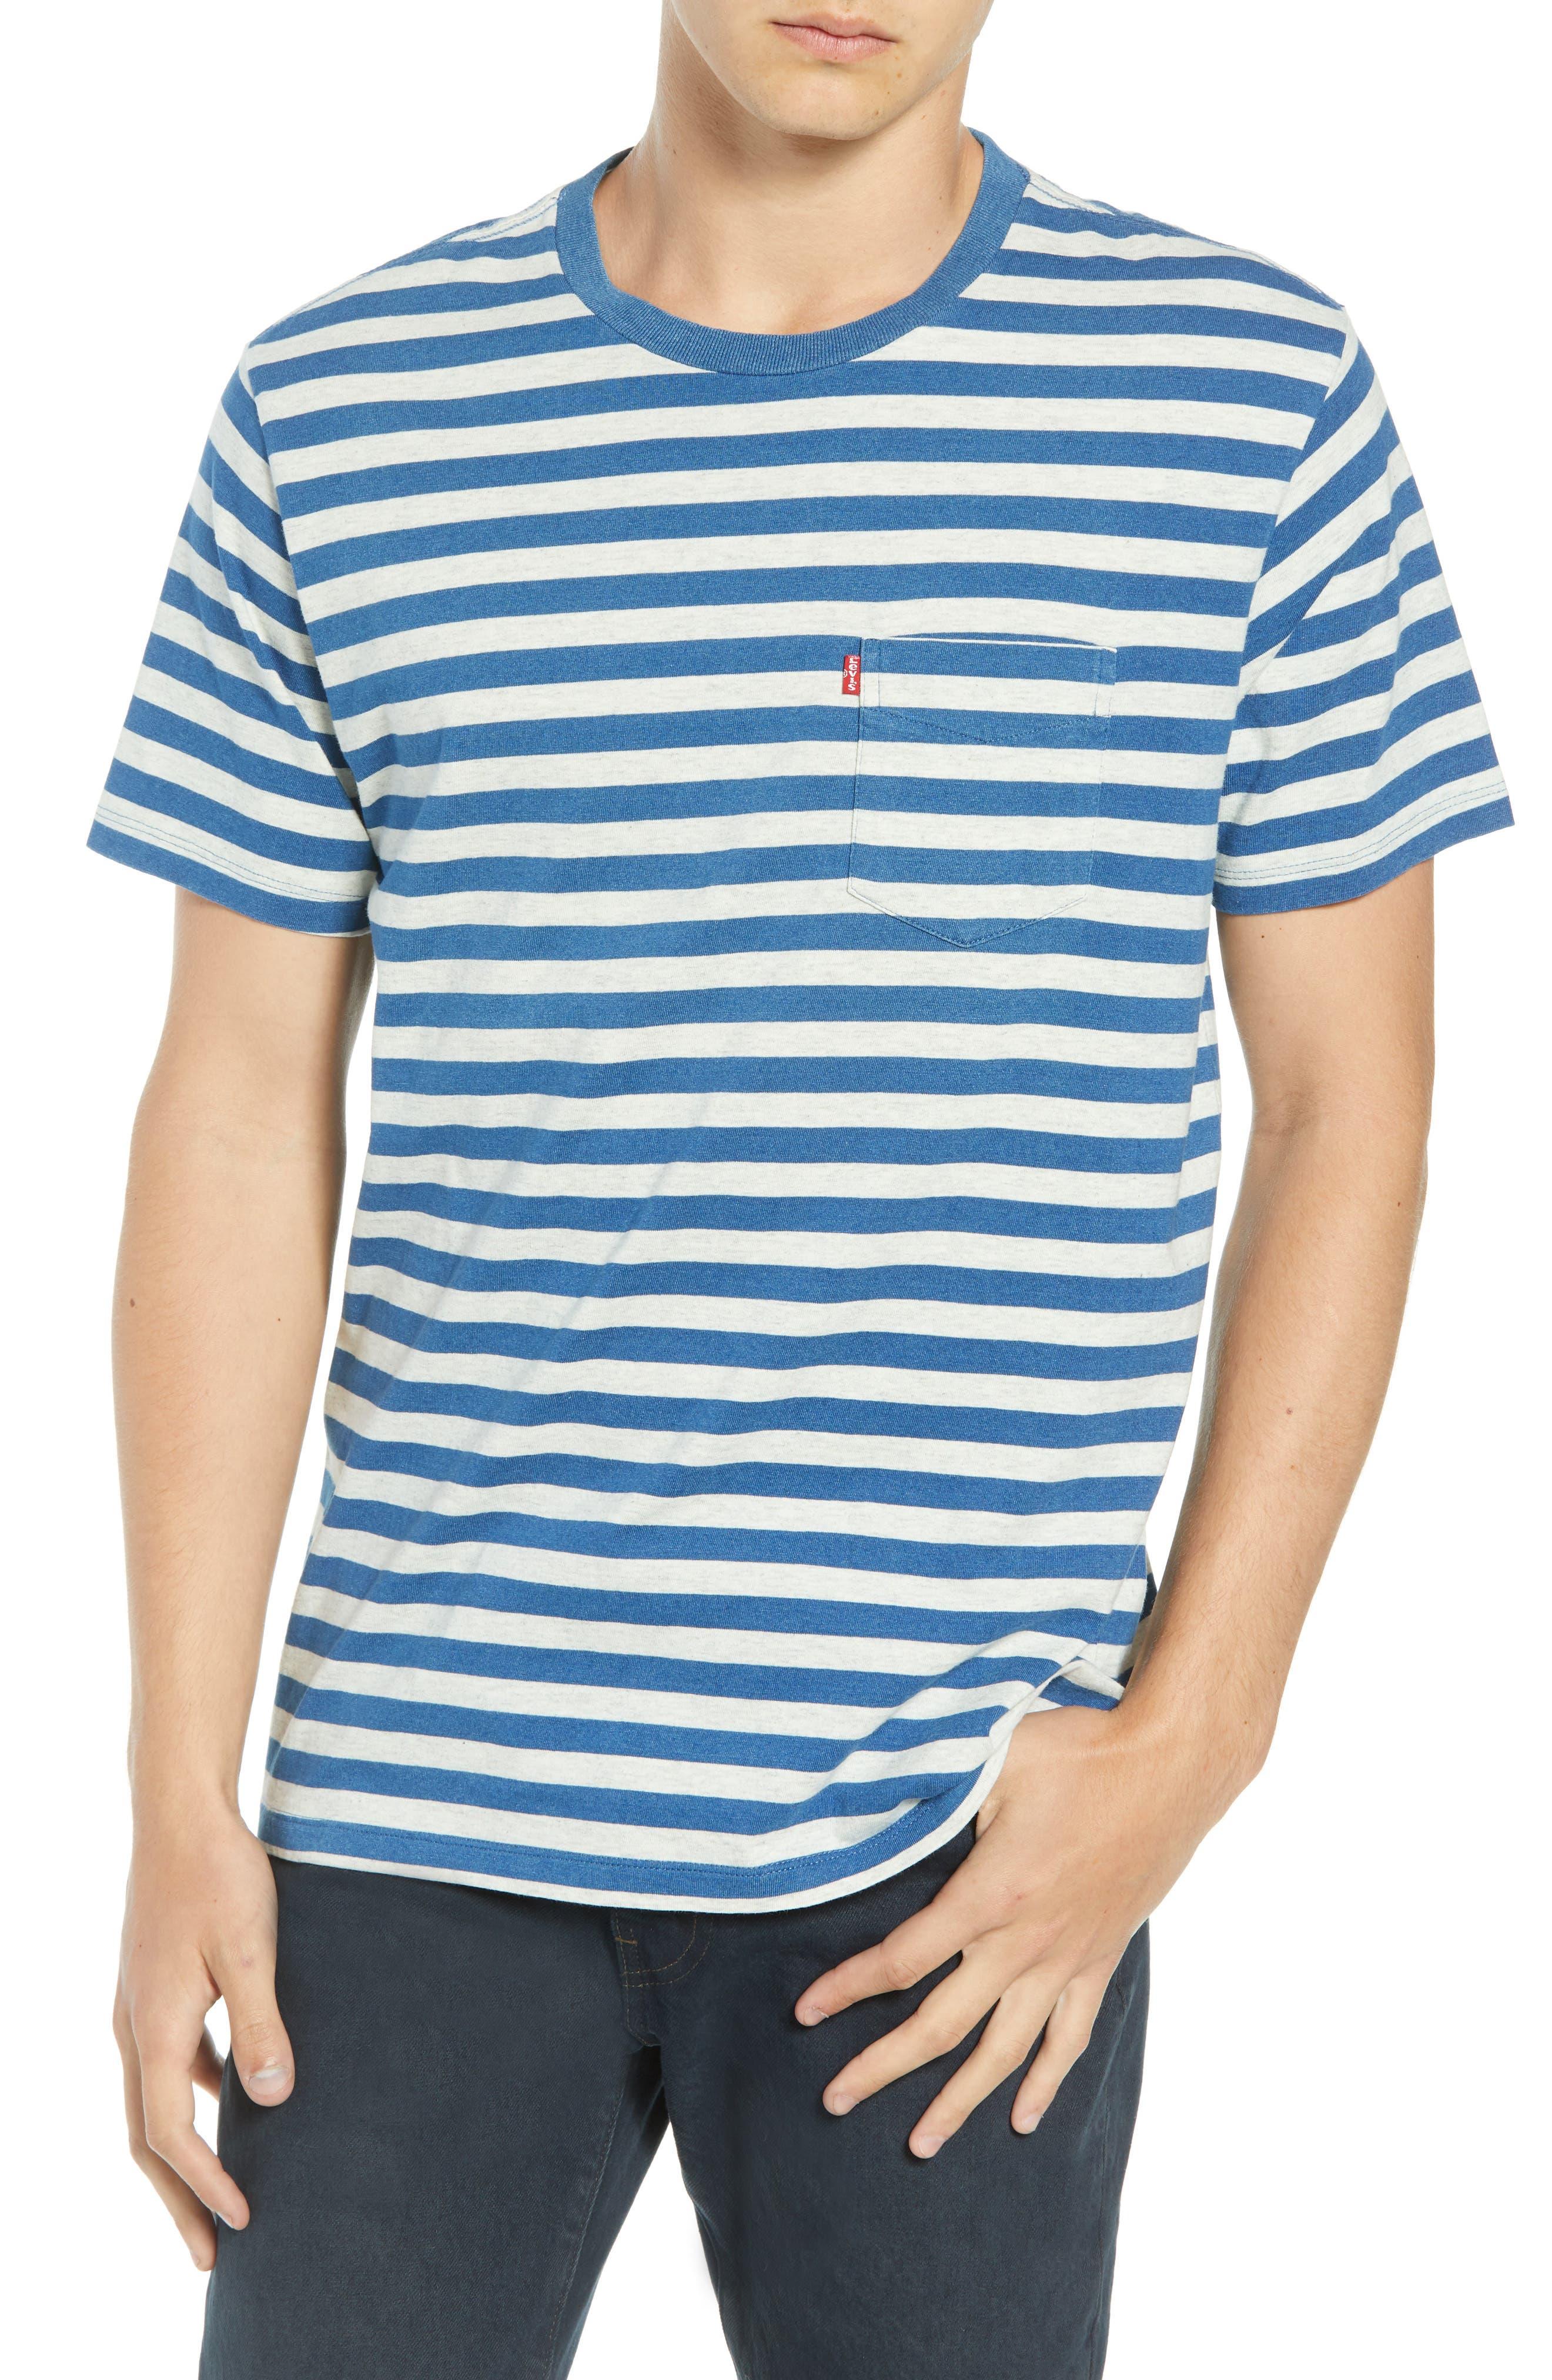 Sunset Stripe Pocket T-Shirt,                             Main thumbnail 1, color,                             CREAM HALF INCH STRIPE